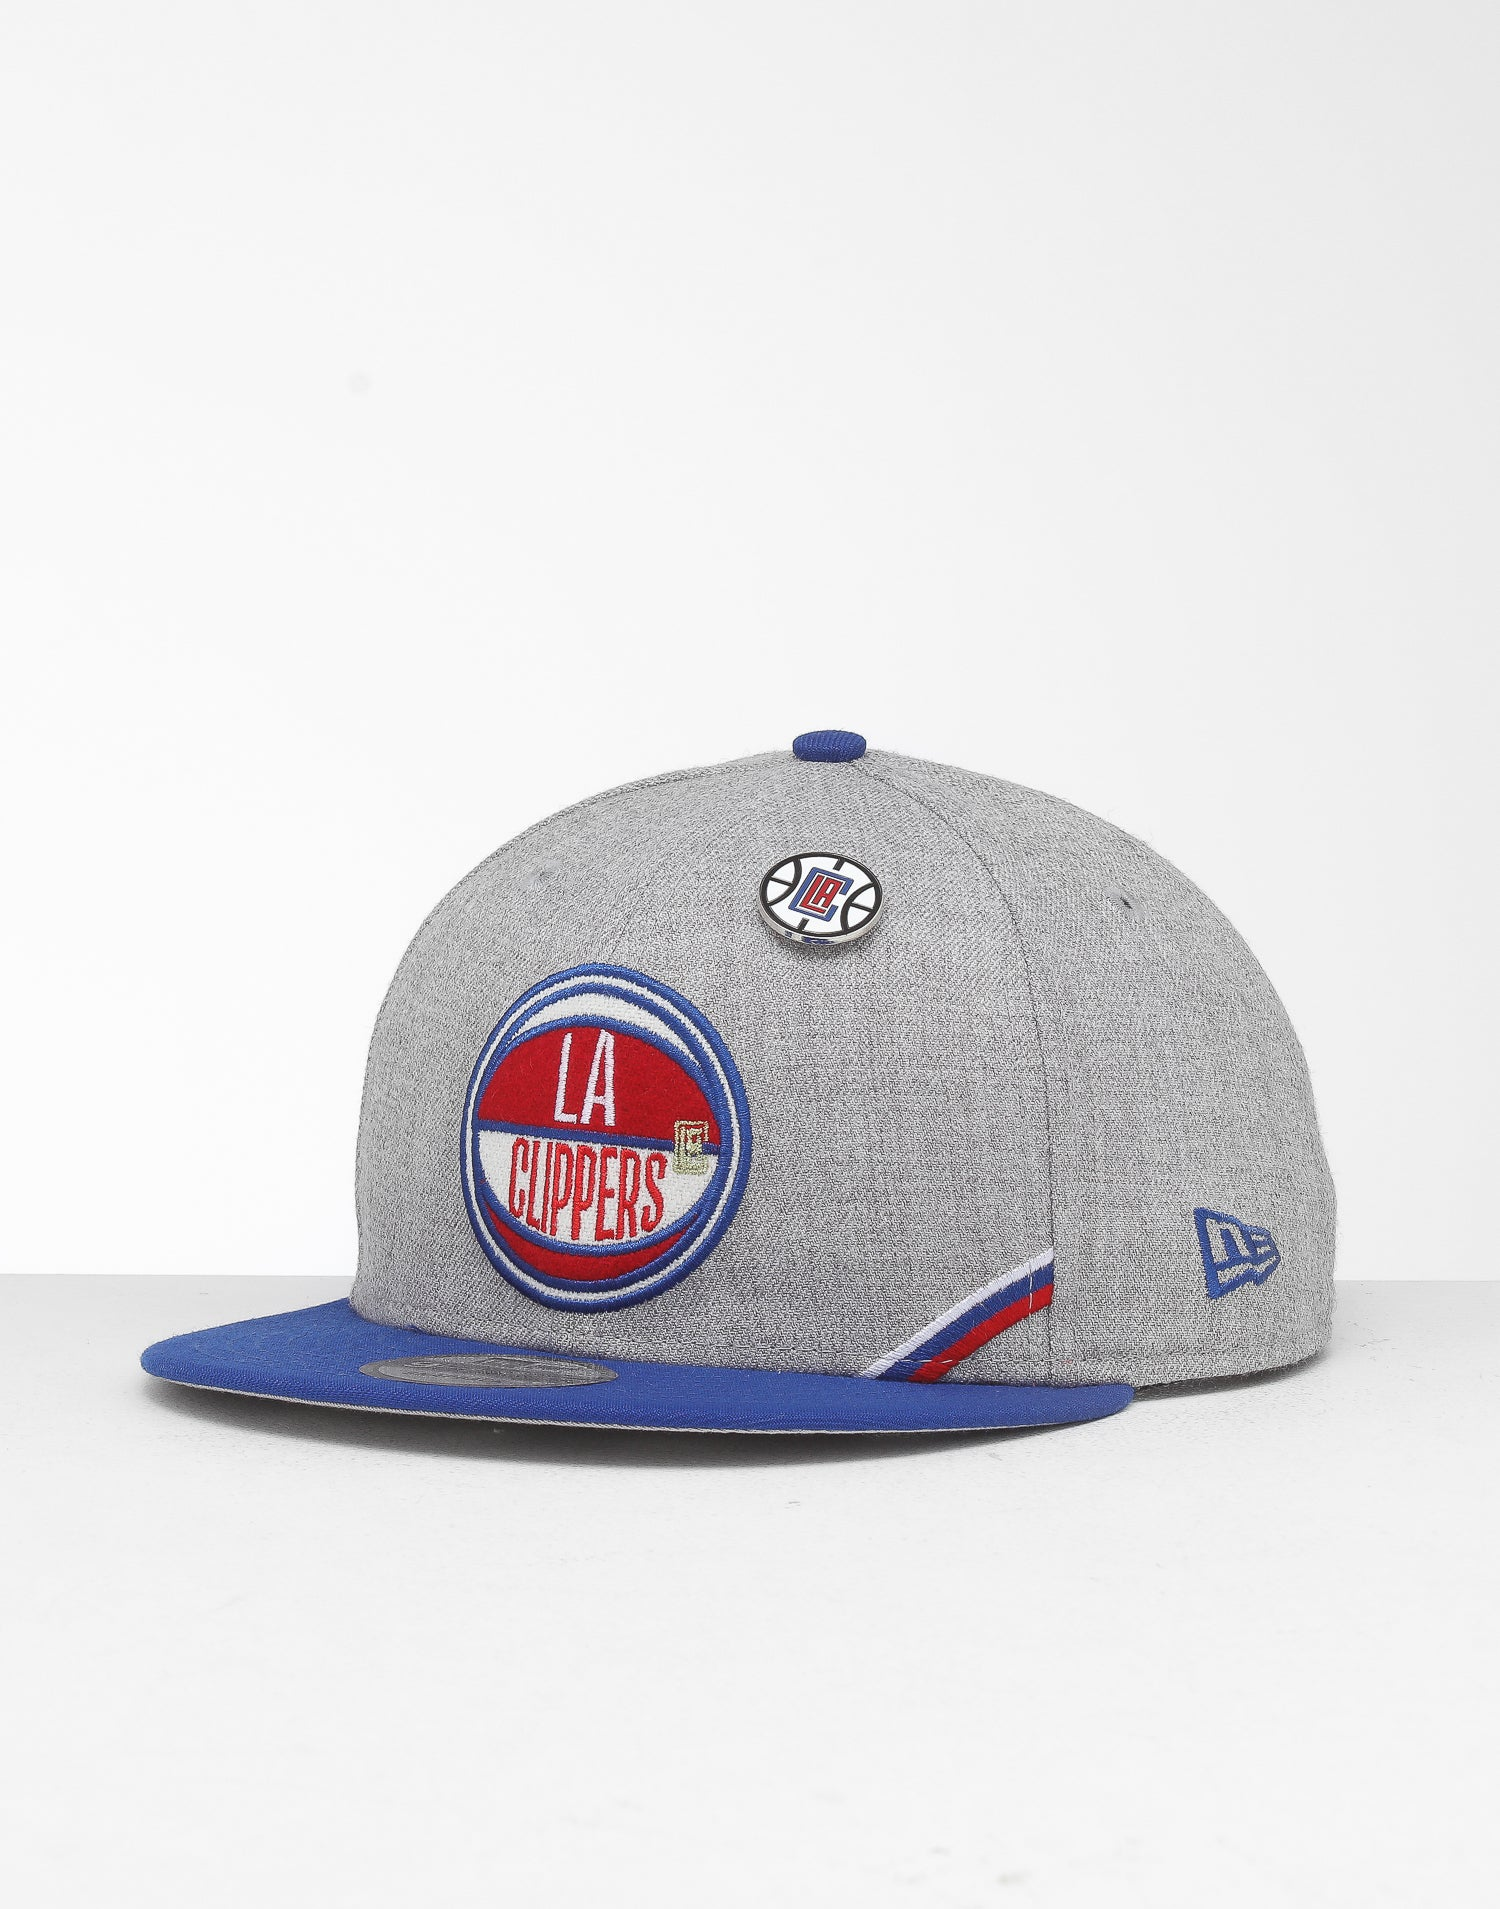 NEW ERA 9FIFTY NBA LOS ANGELES CLIPPERS LA BLACK RED JERSEY SNAPBACK CAP HAT NWT